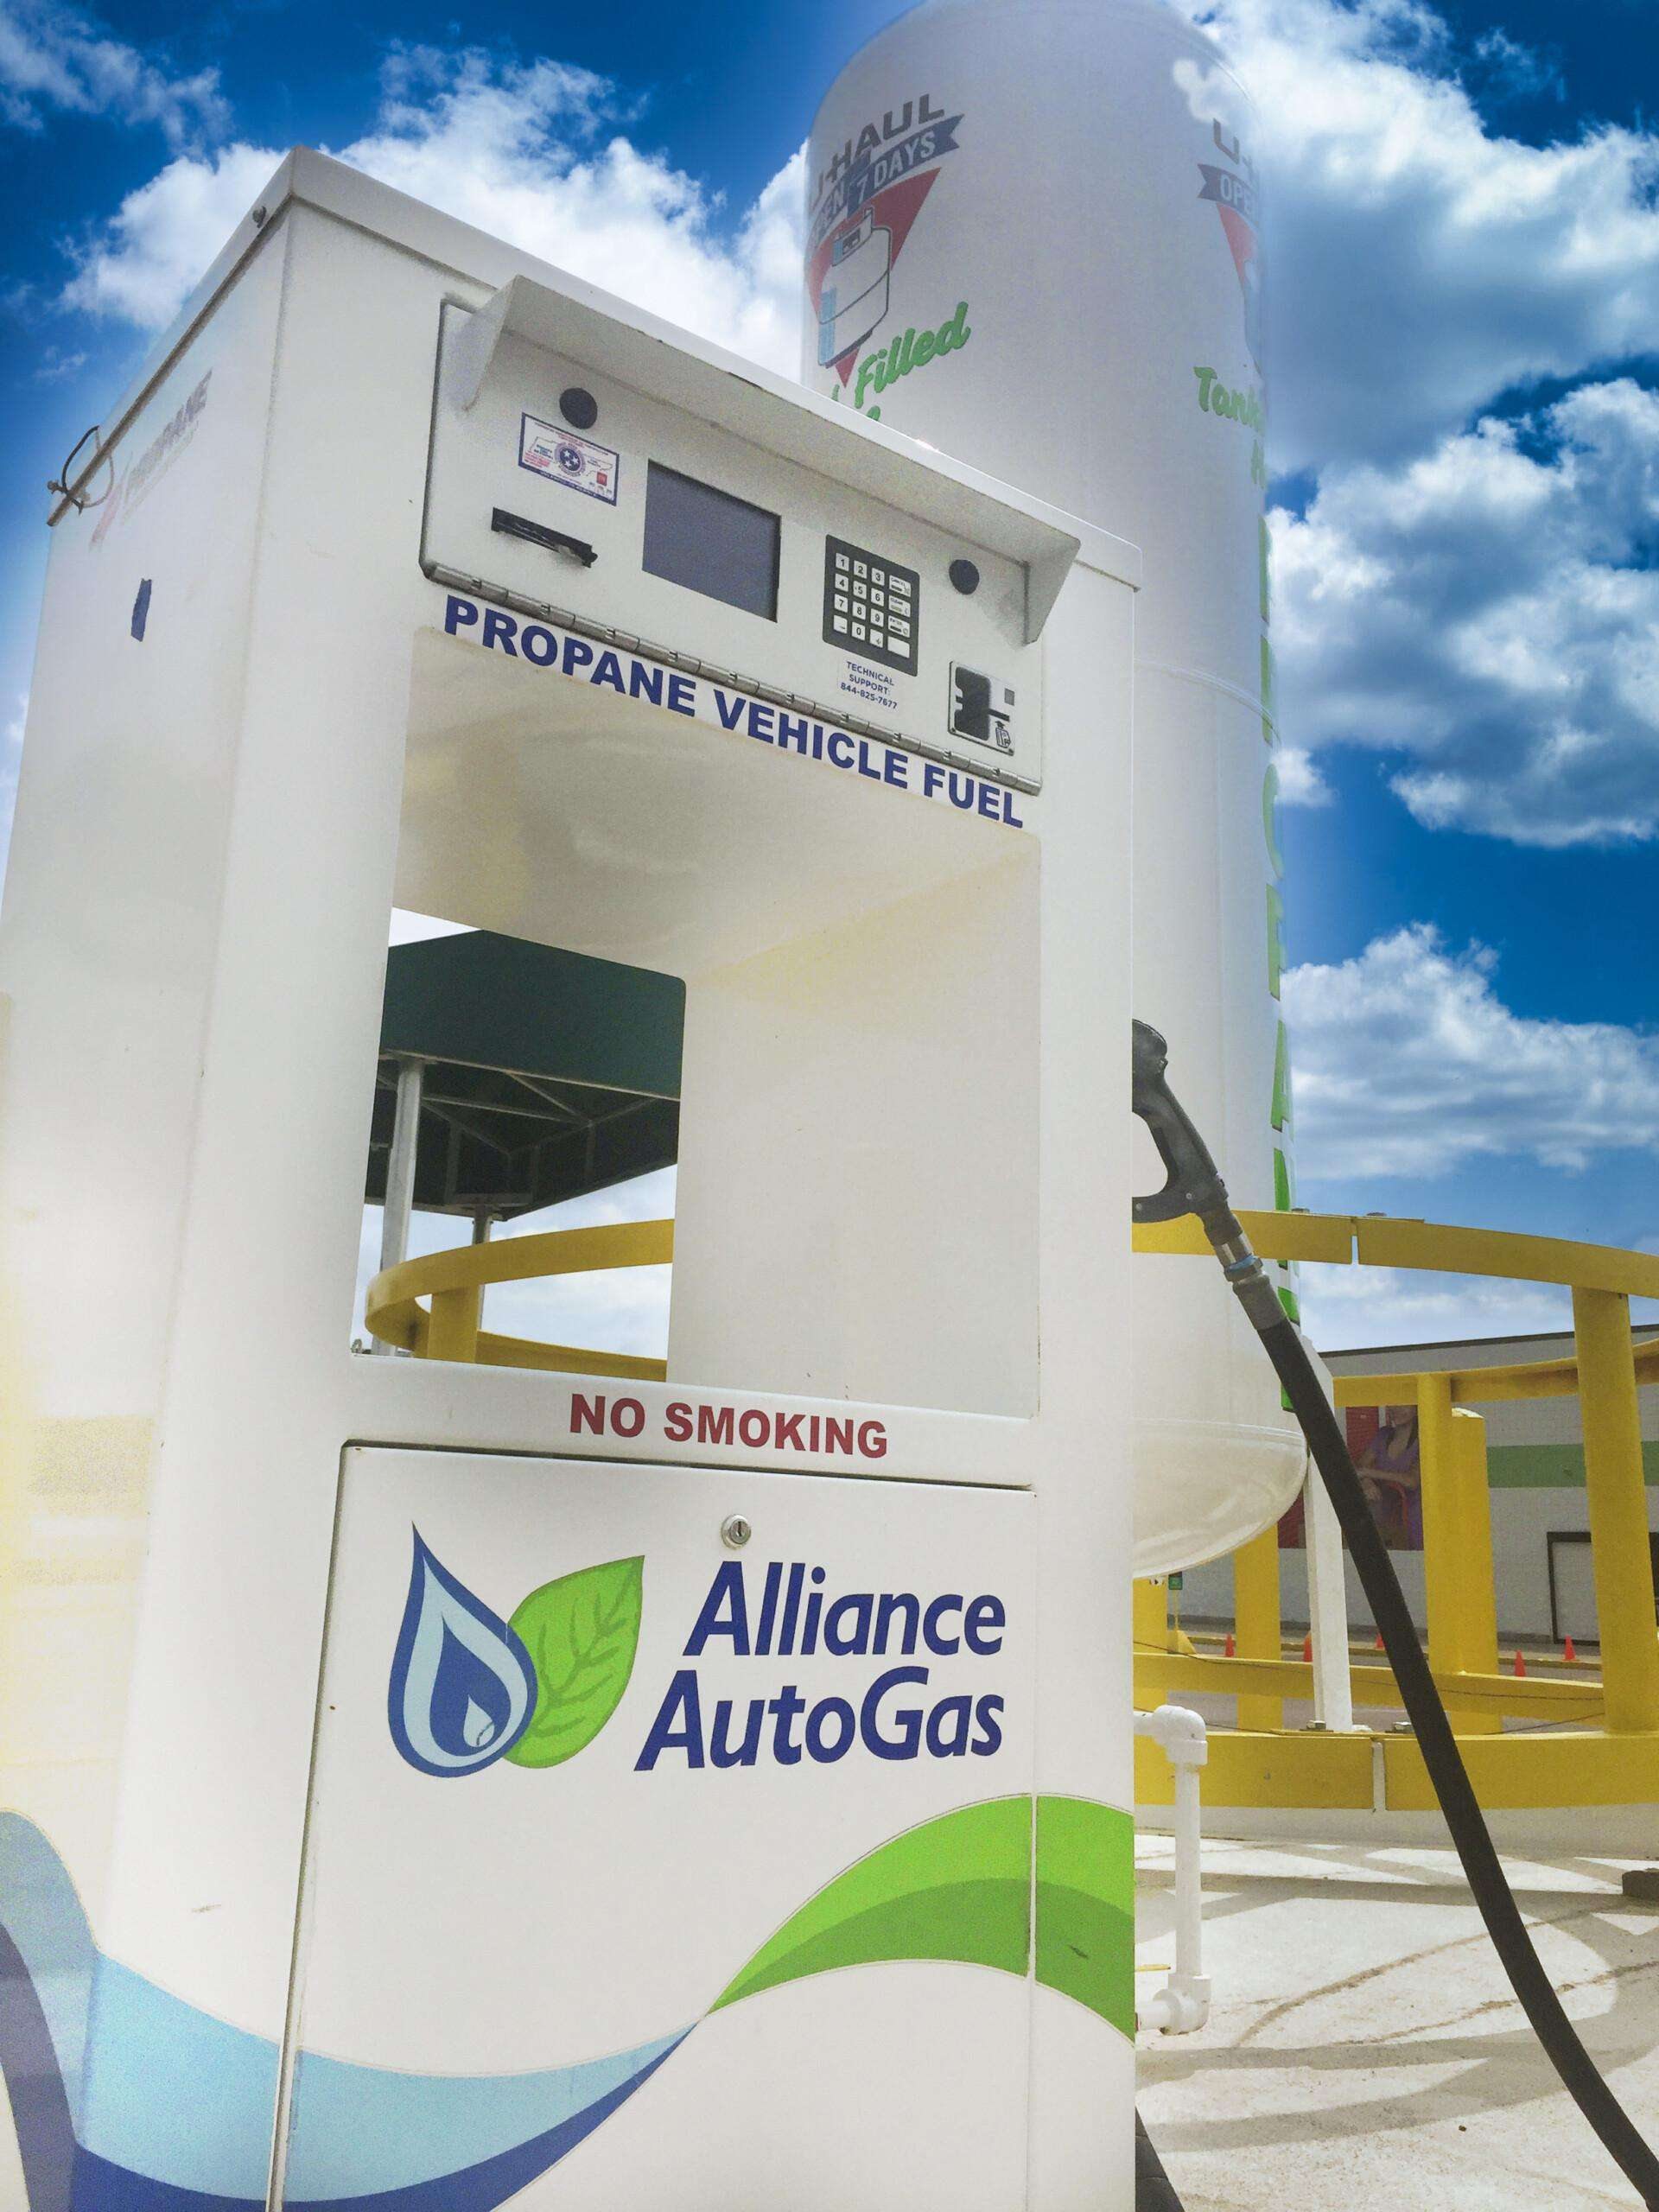 Alliance AutoGas propane vehicle refueling station at U-Haul facility